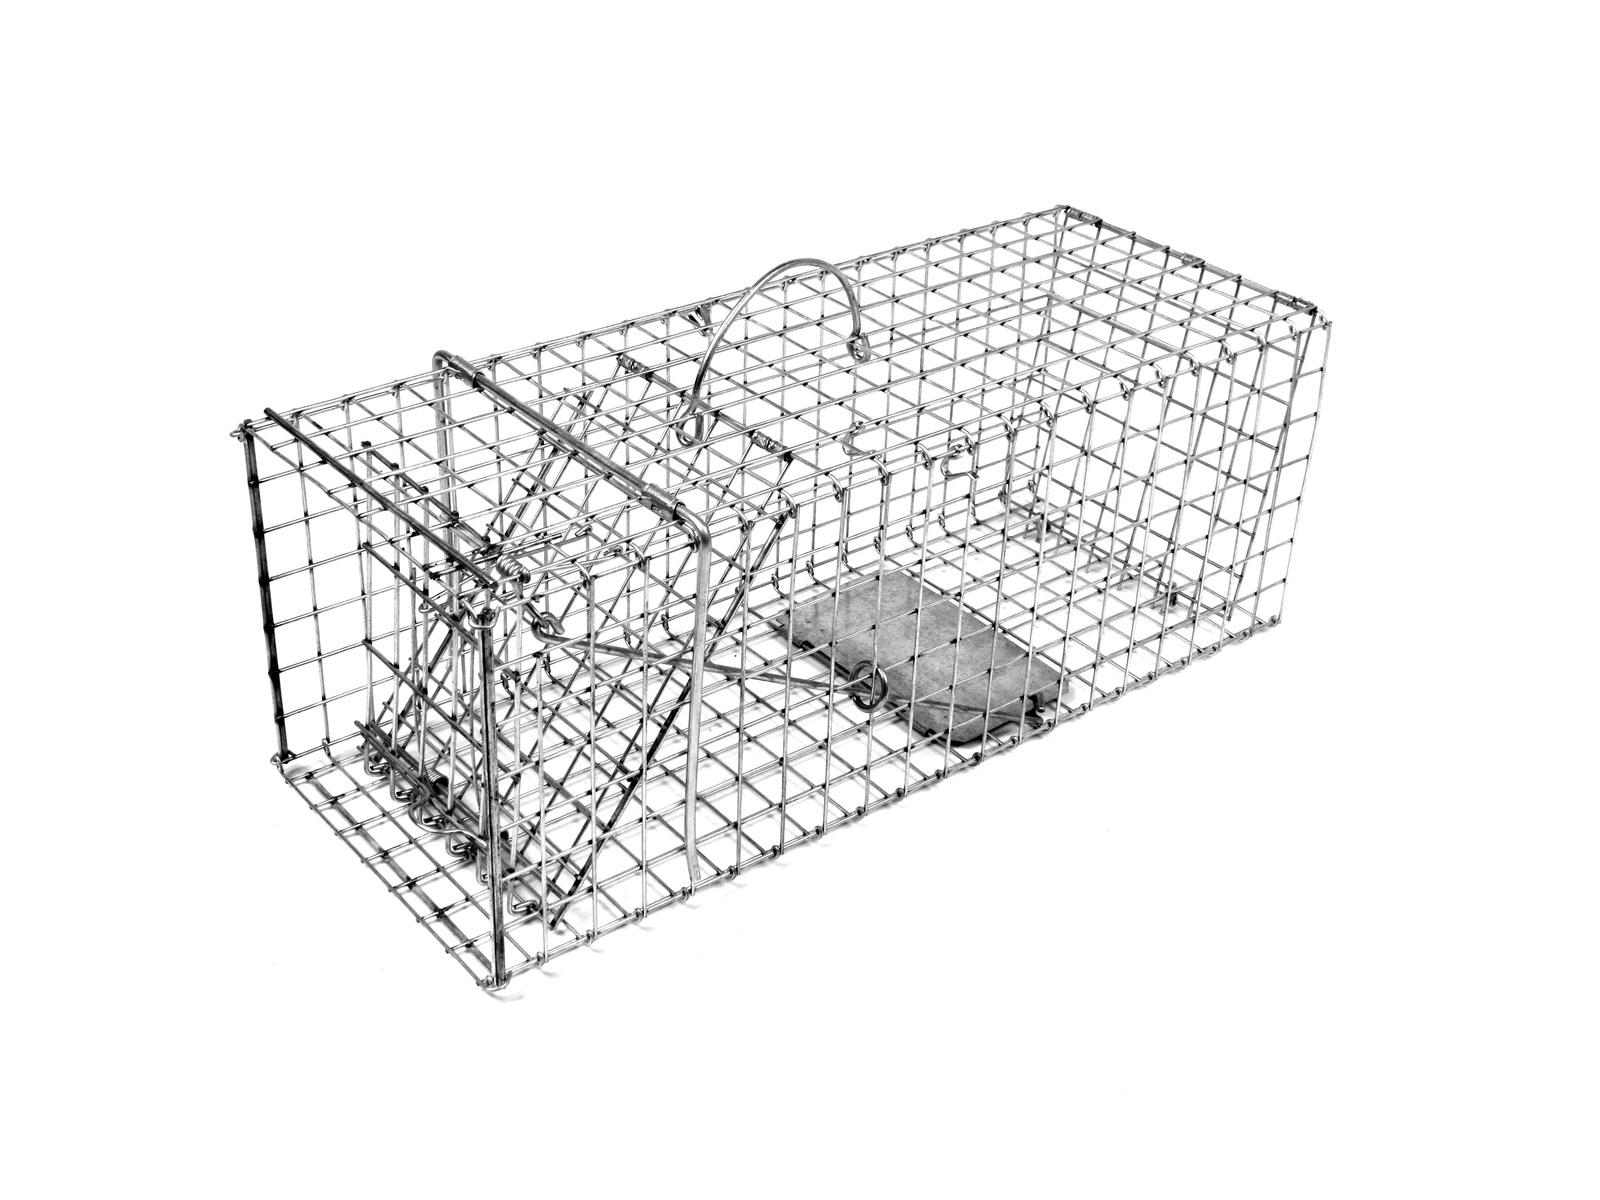 Tomahawk Model 204 Collapsible Skunk Prairie Dog Trap